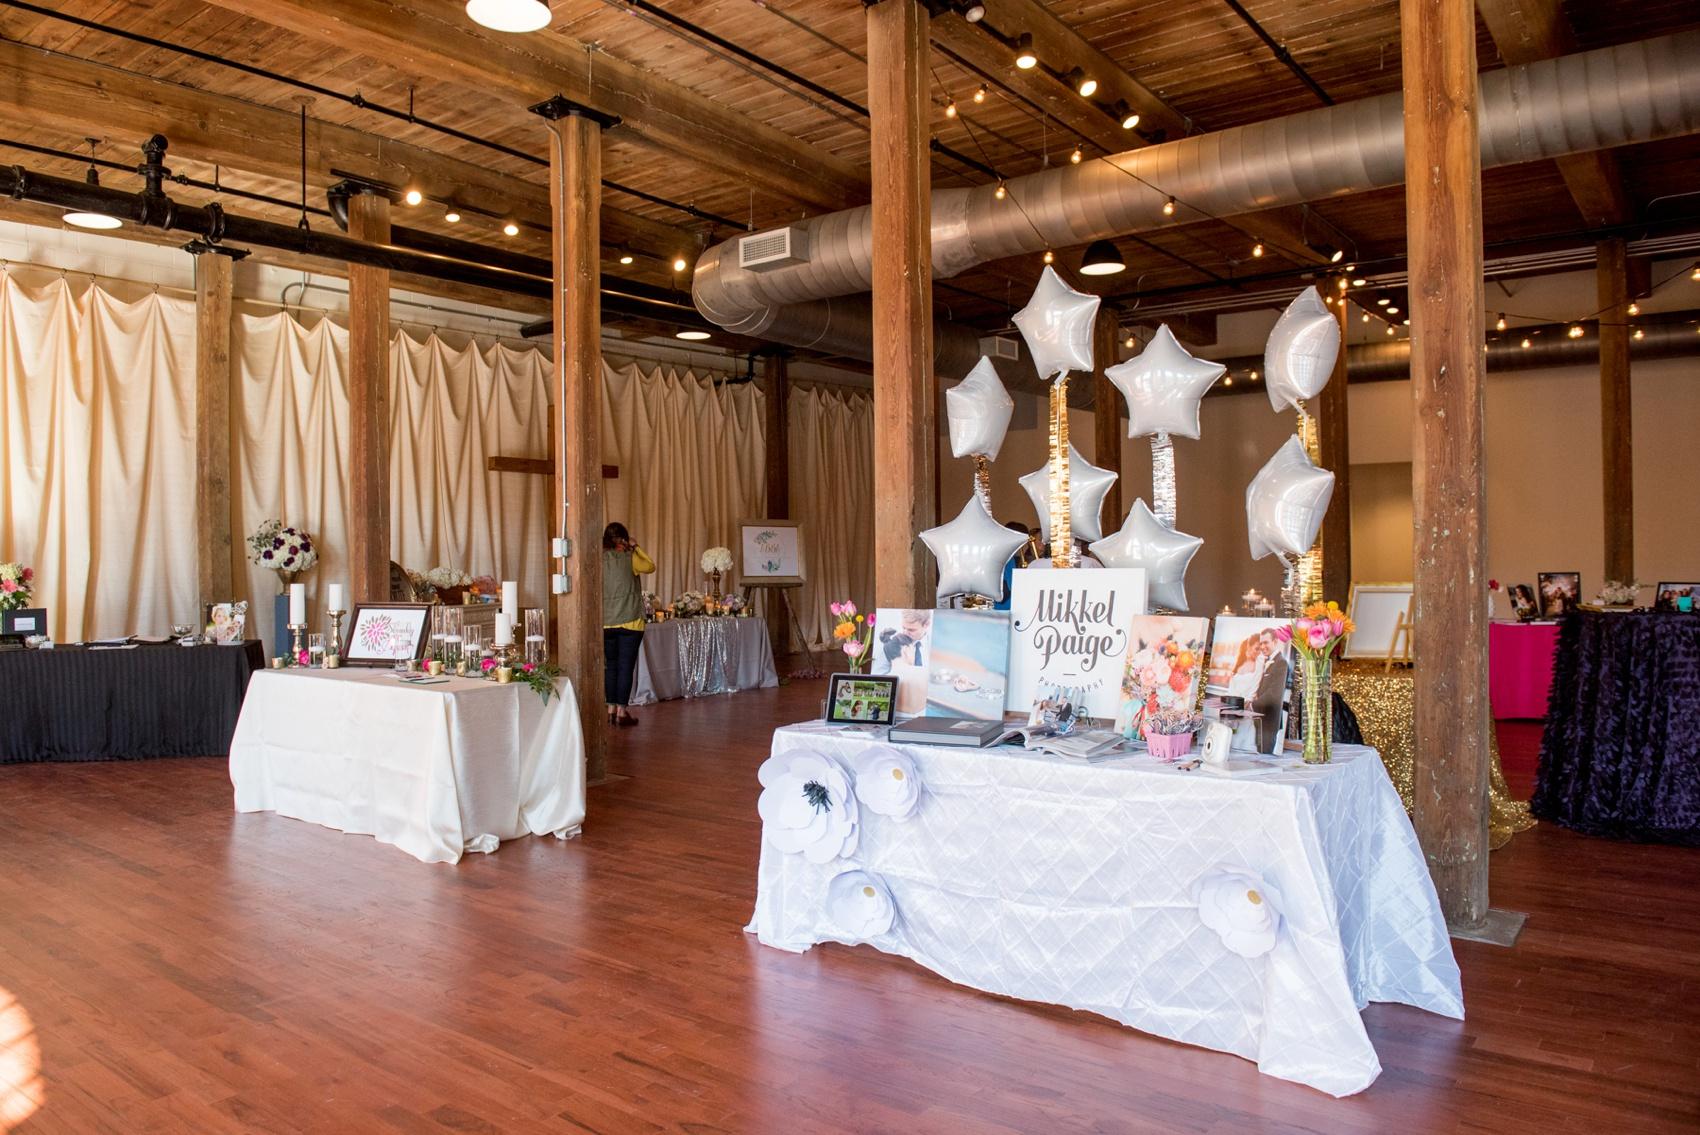 The Cloth Mill North Carolina wedding vendor showcase. Photographer Mikkel Paige Photography's table display.